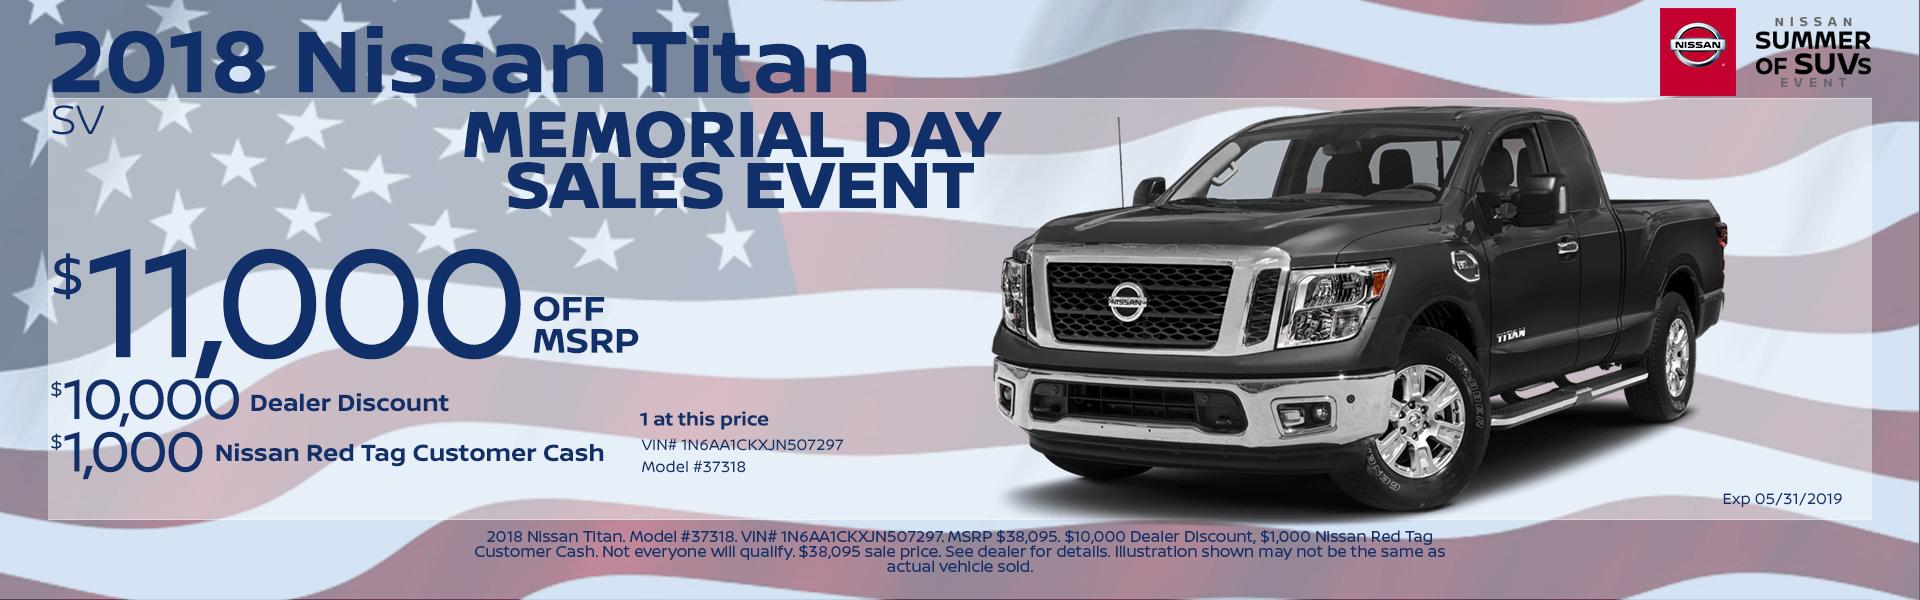 2018 Nissan Titan Special